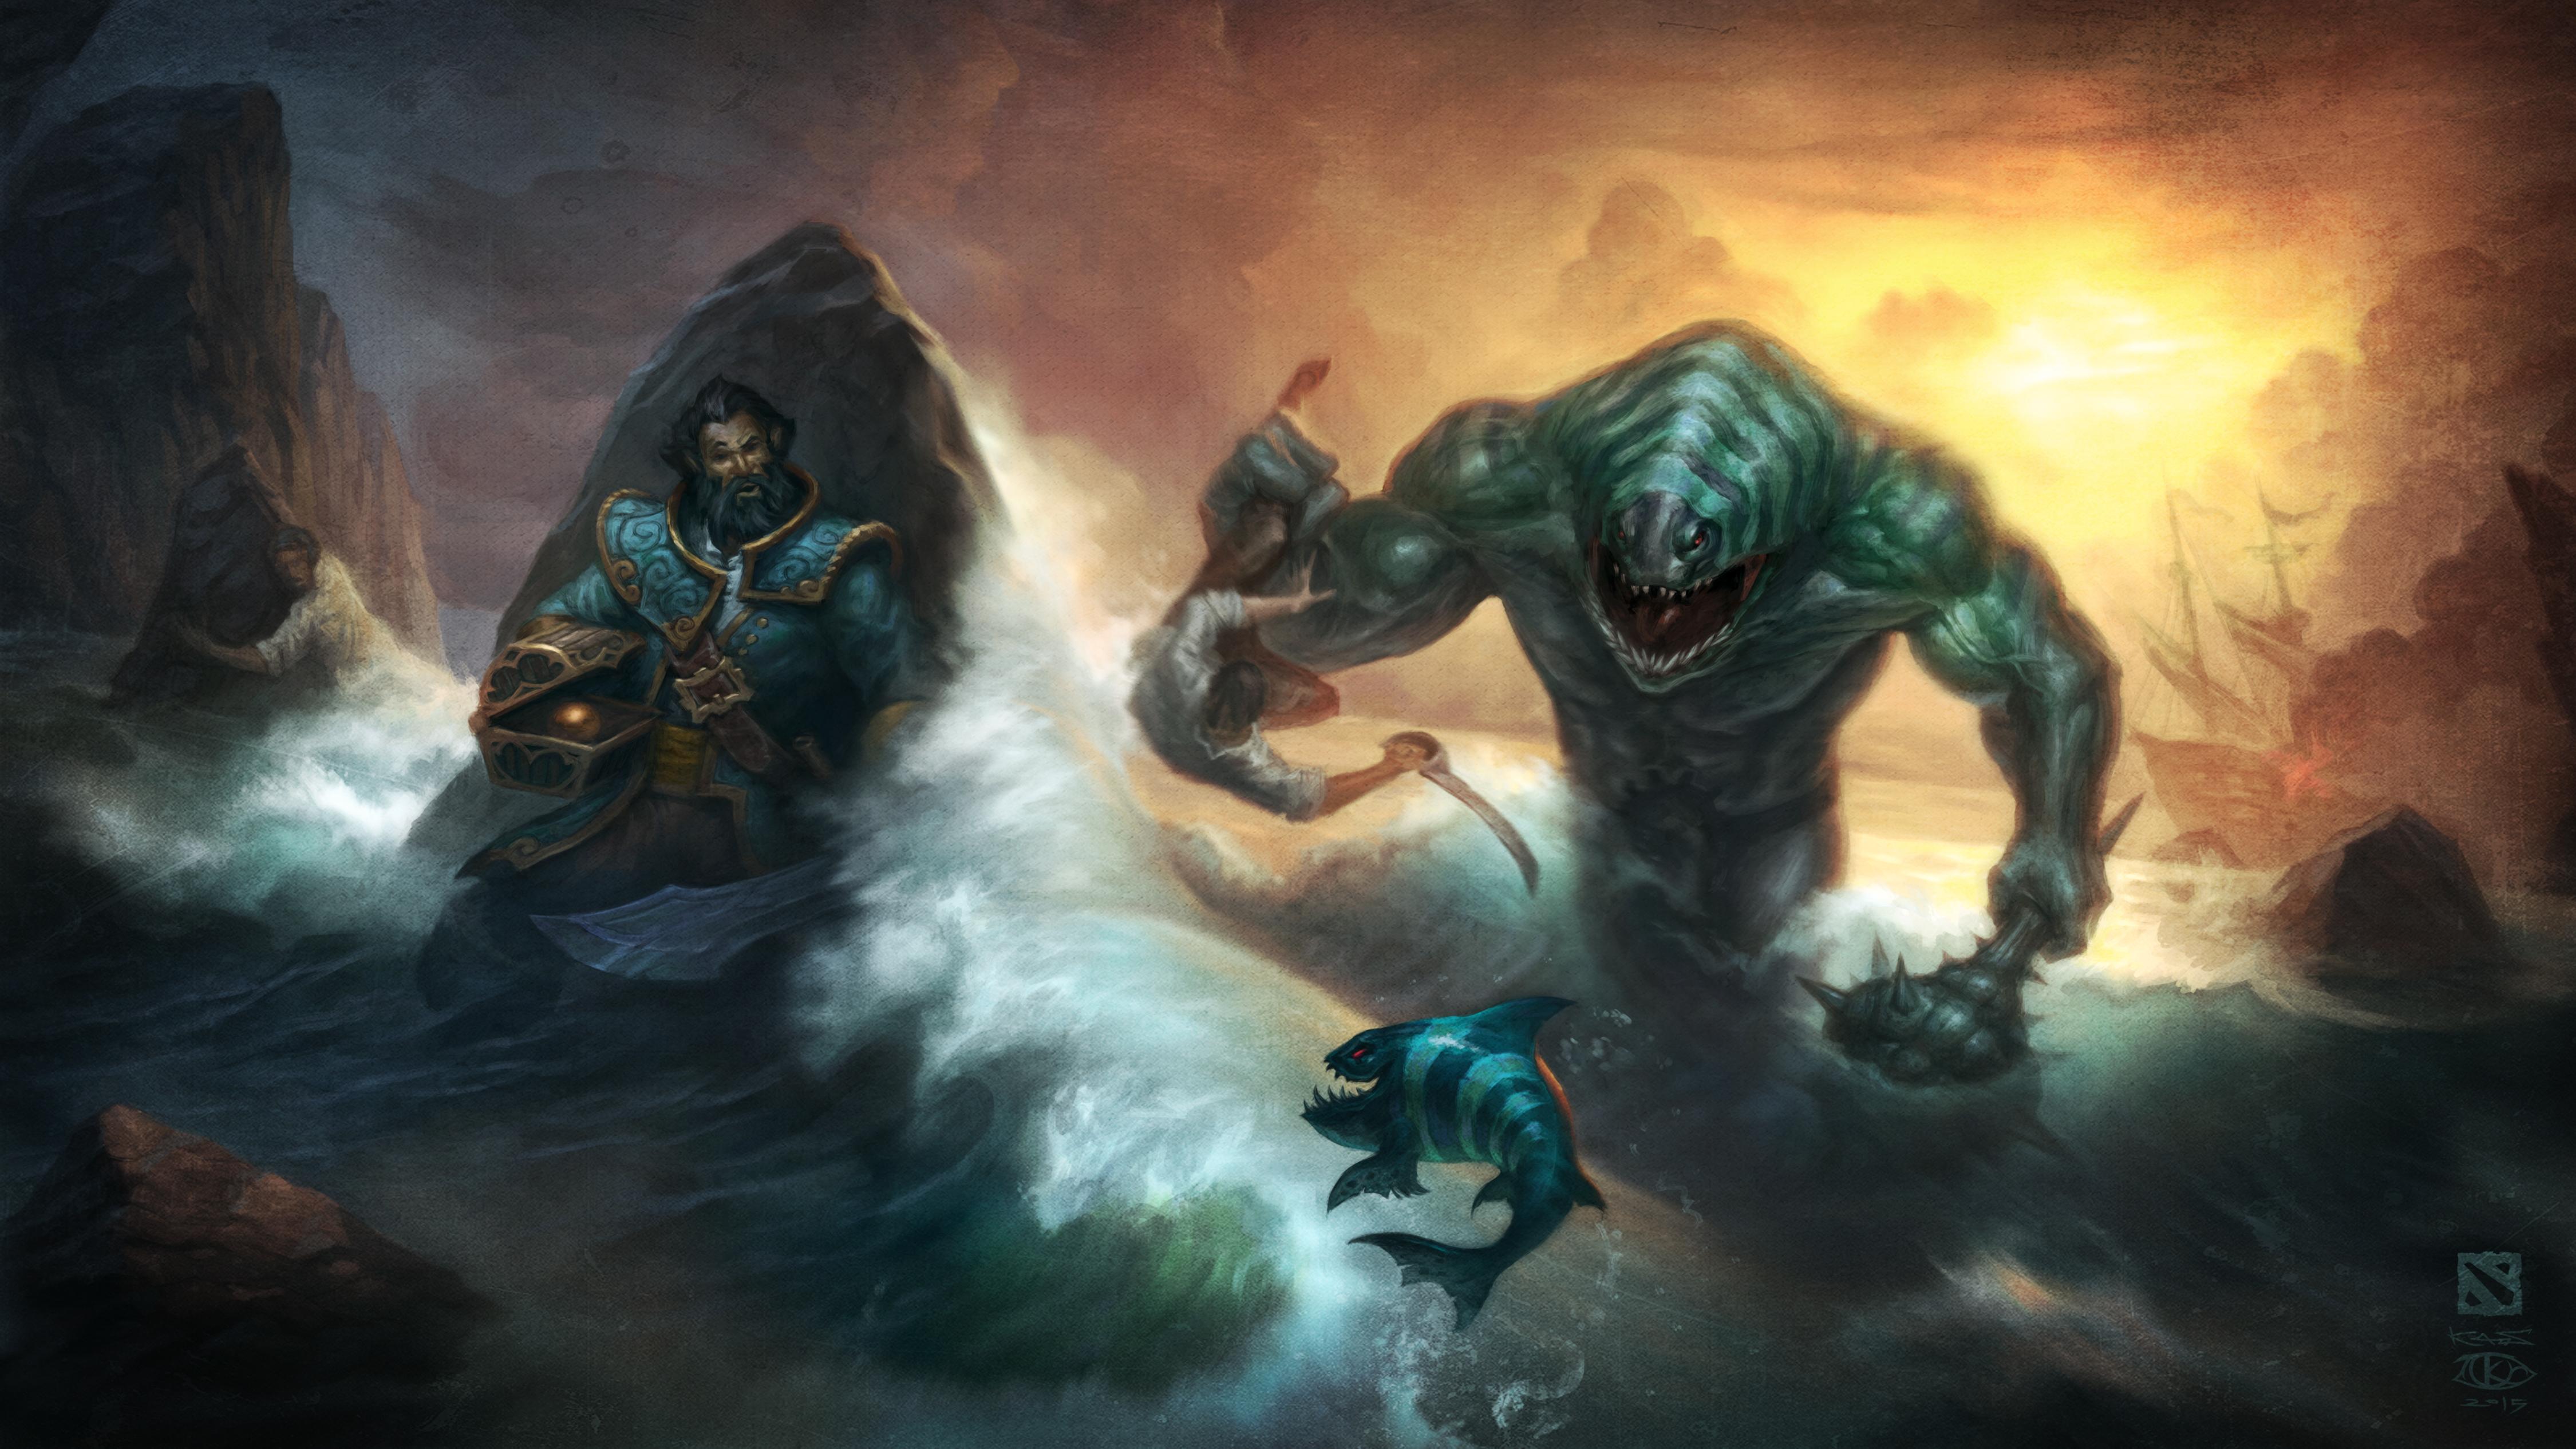 Images DOTA 2 Kunkka Tidehunter Fantasy Games 4500x2531 4500x2531